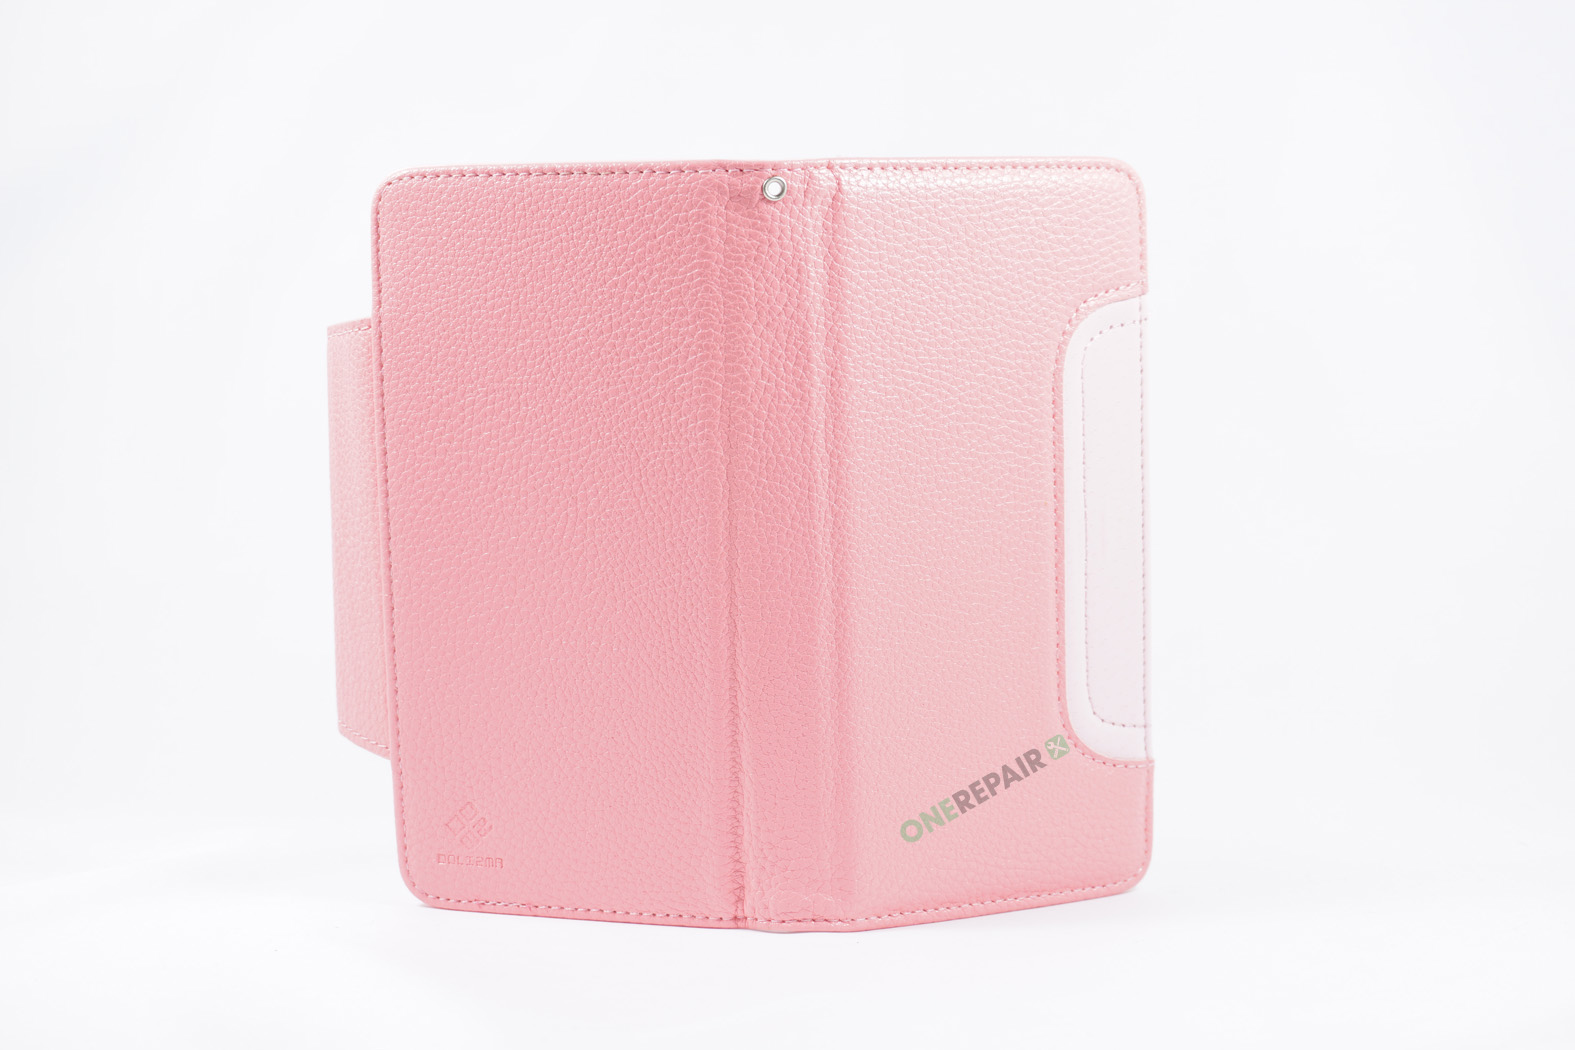 350852_iPhone_7+_8+_Plus_Flipcover_Magnet_Cover_Lyseroed_Pink_OneRepair_WM_00004